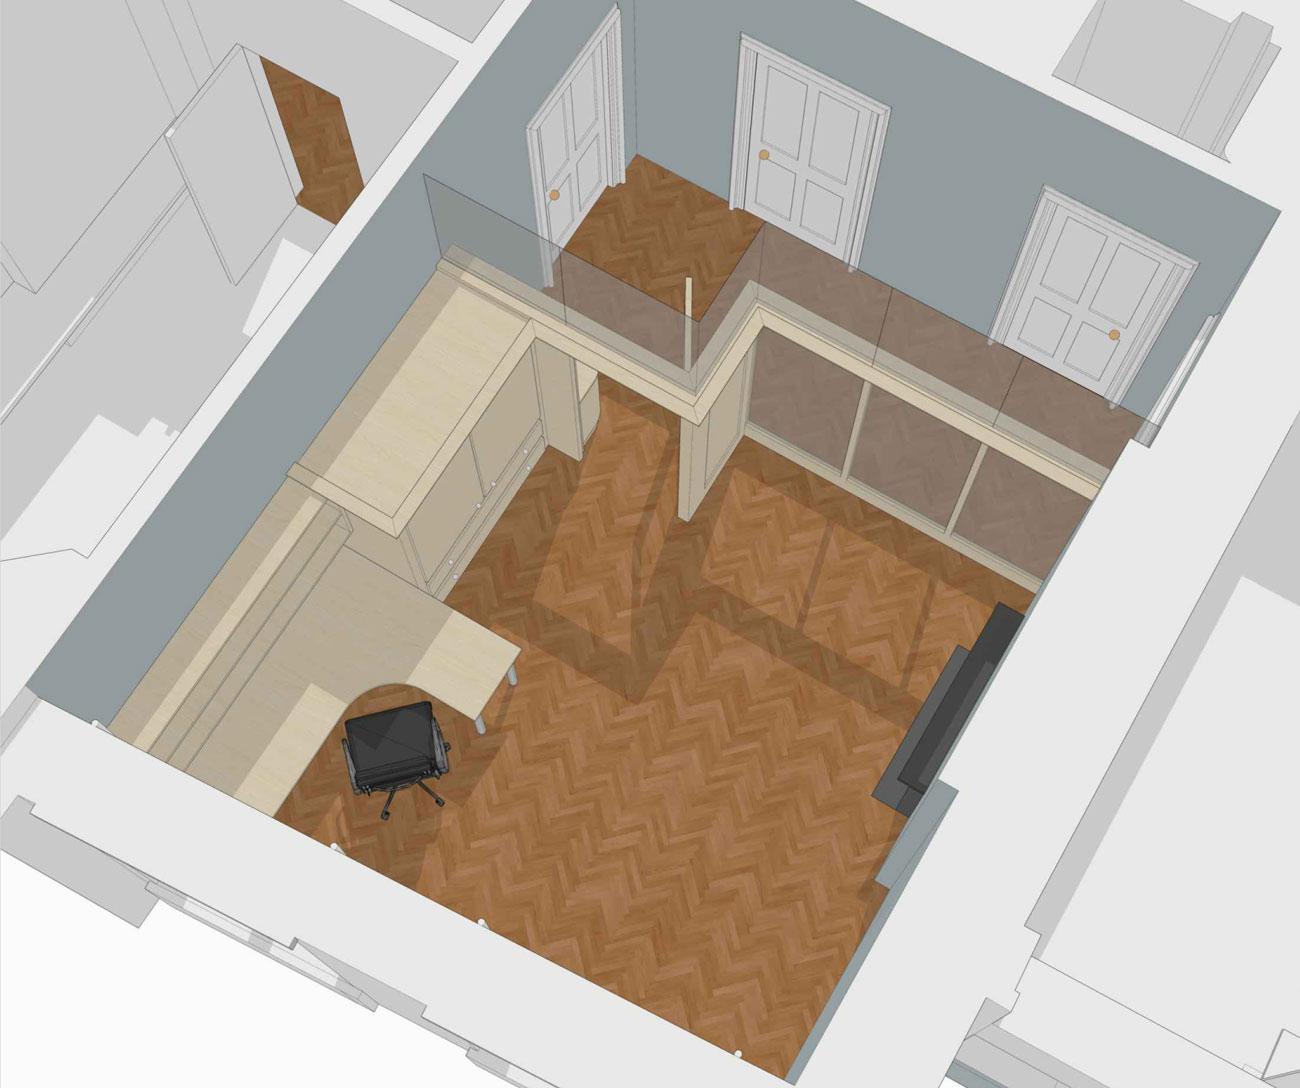 St-Dunstans-church-room-3dplan4